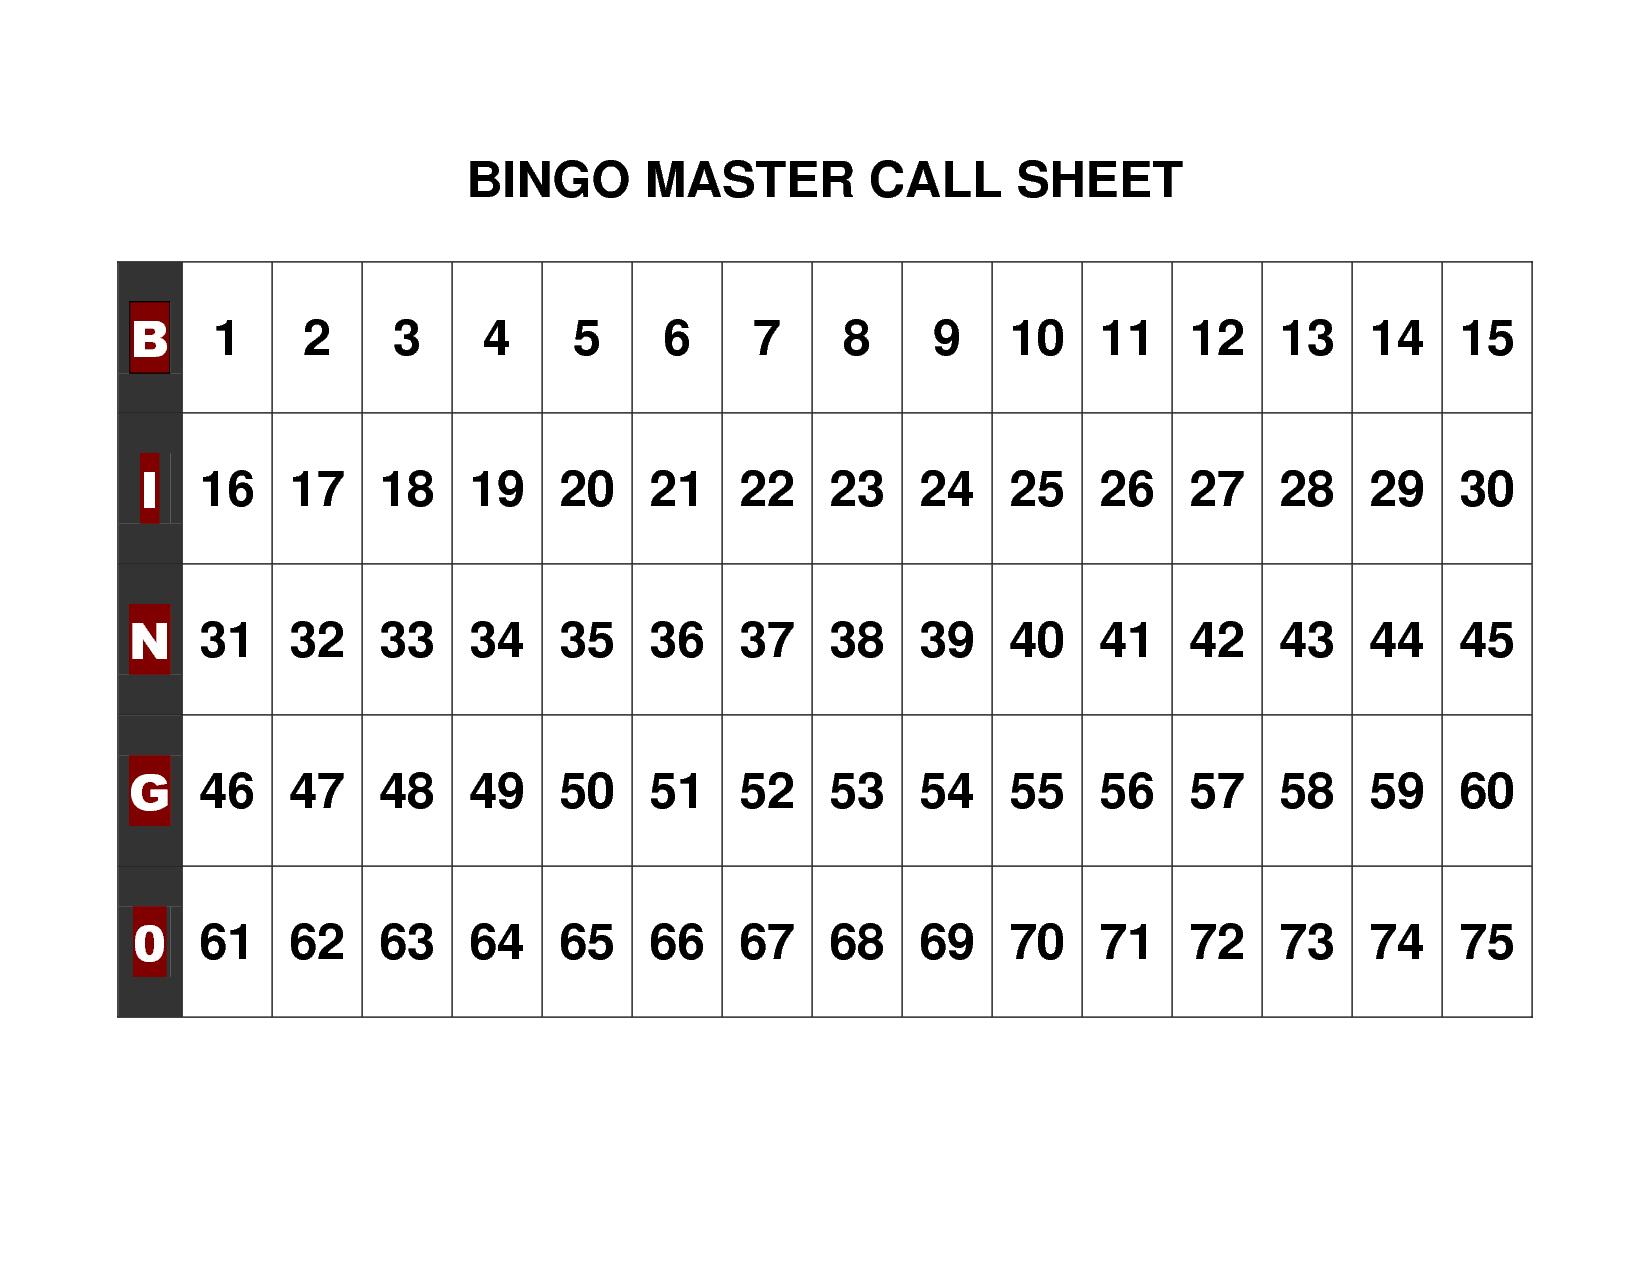 Free+Printable+Bingo+Call+Sheet | Bingo | Bingo Calls, Bingo, Free - Free Printable Bingo Cards 1 100